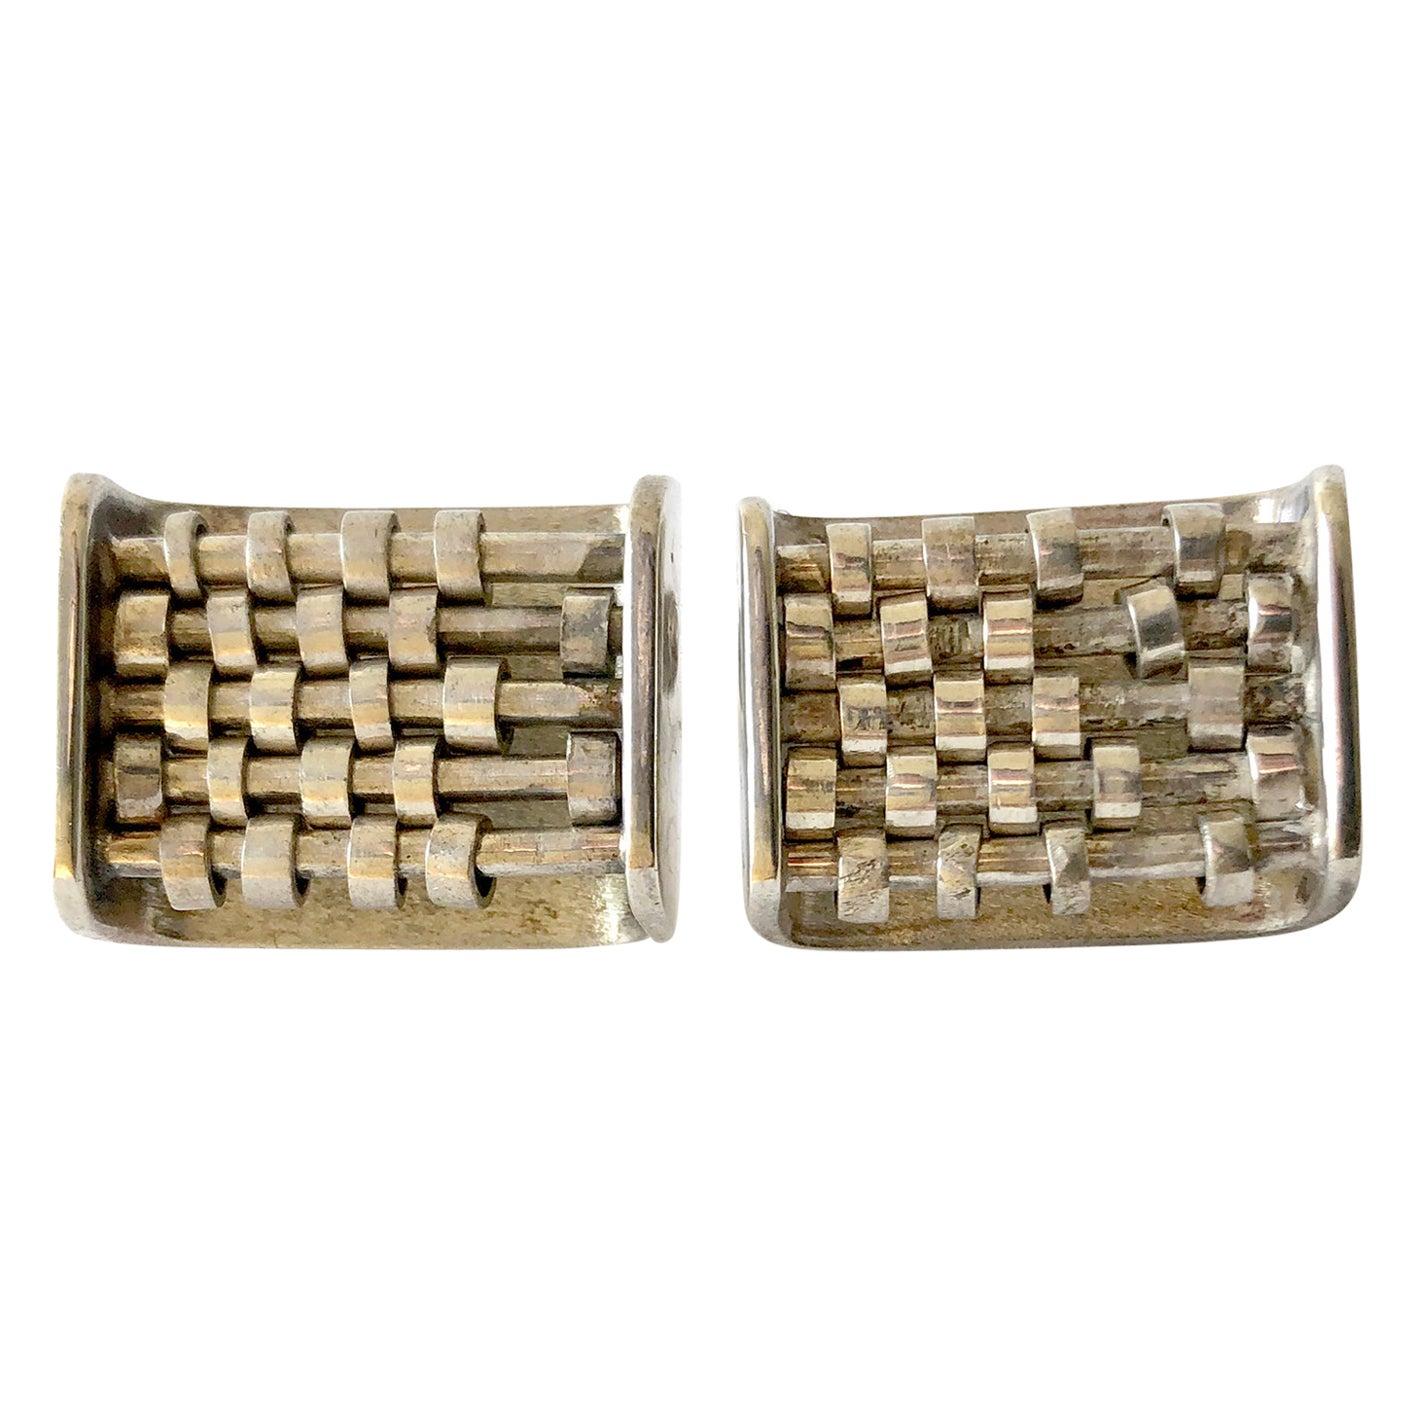 Rare John Syzmak Sterling Silver American Modernist Kinetic Abacus Cufflinks